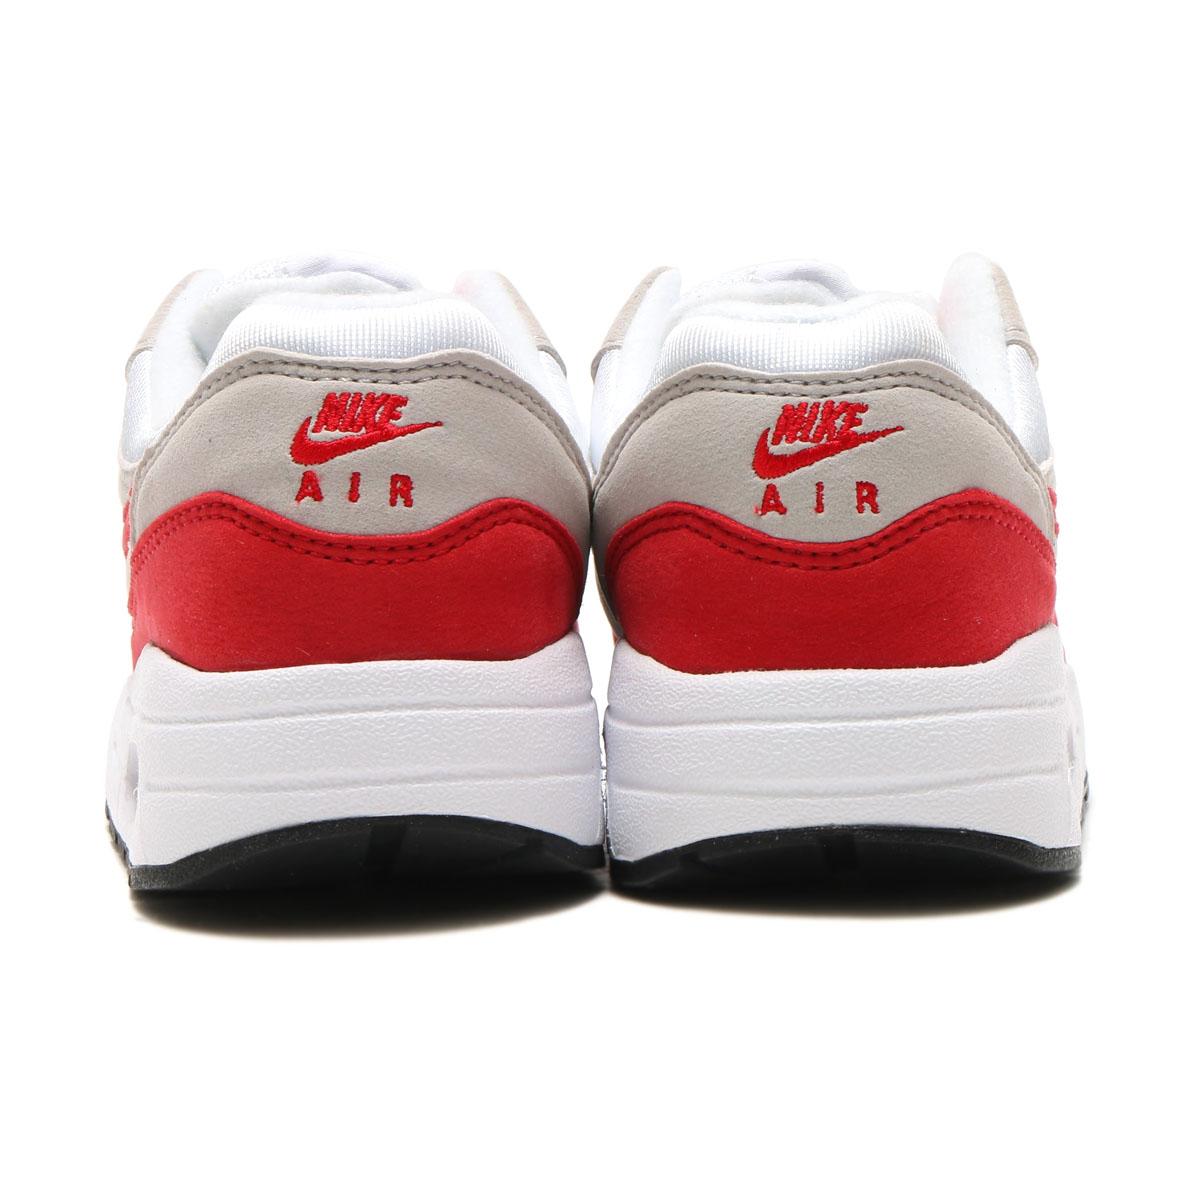 Nike Air Max 1 QS (ps) WhiteUniversity Red Neutral Grey Black 919891 101